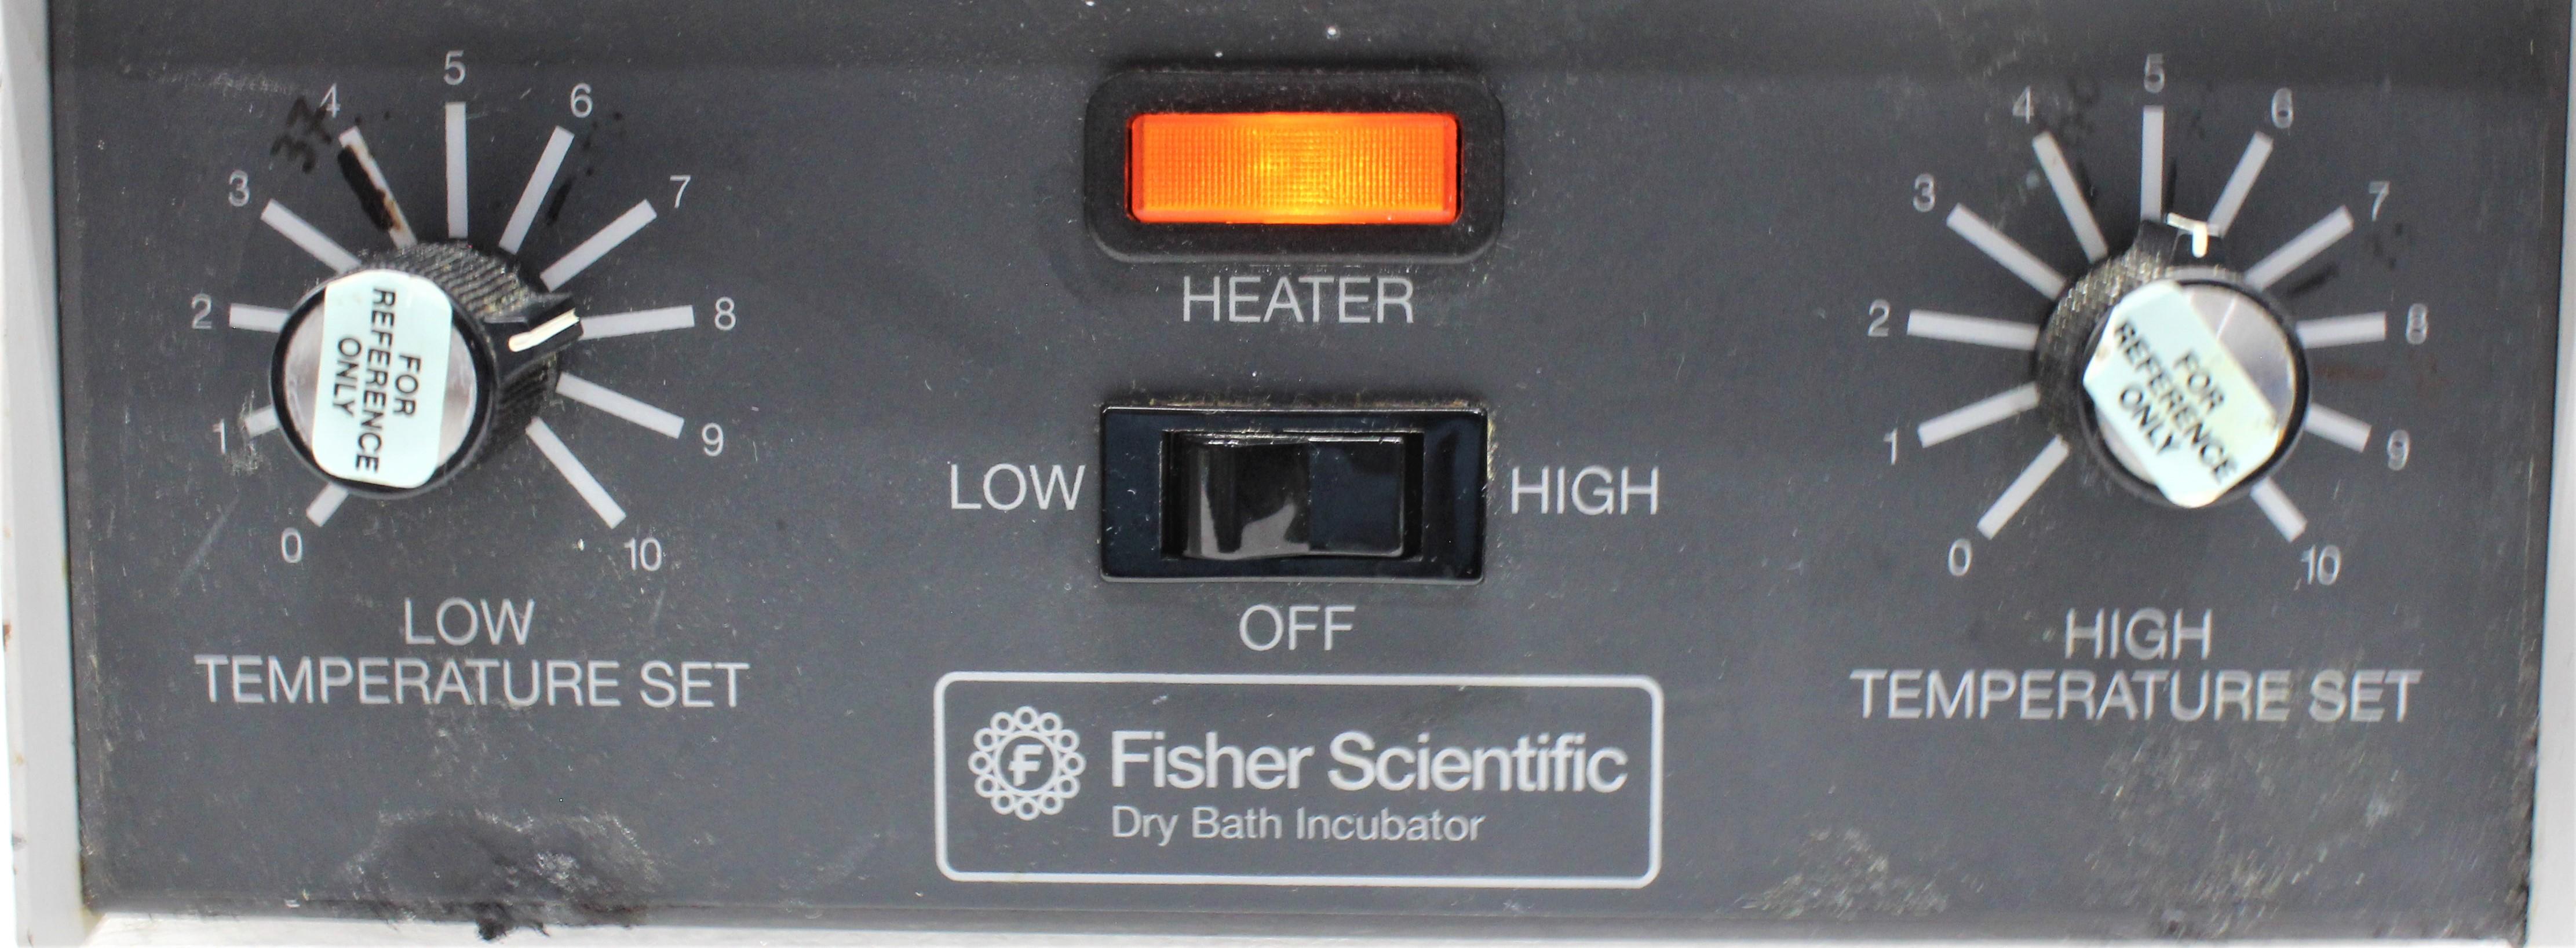 Image FISHER SCIENTIFIC 11-718-2 Dry Bath Incubator 1586971